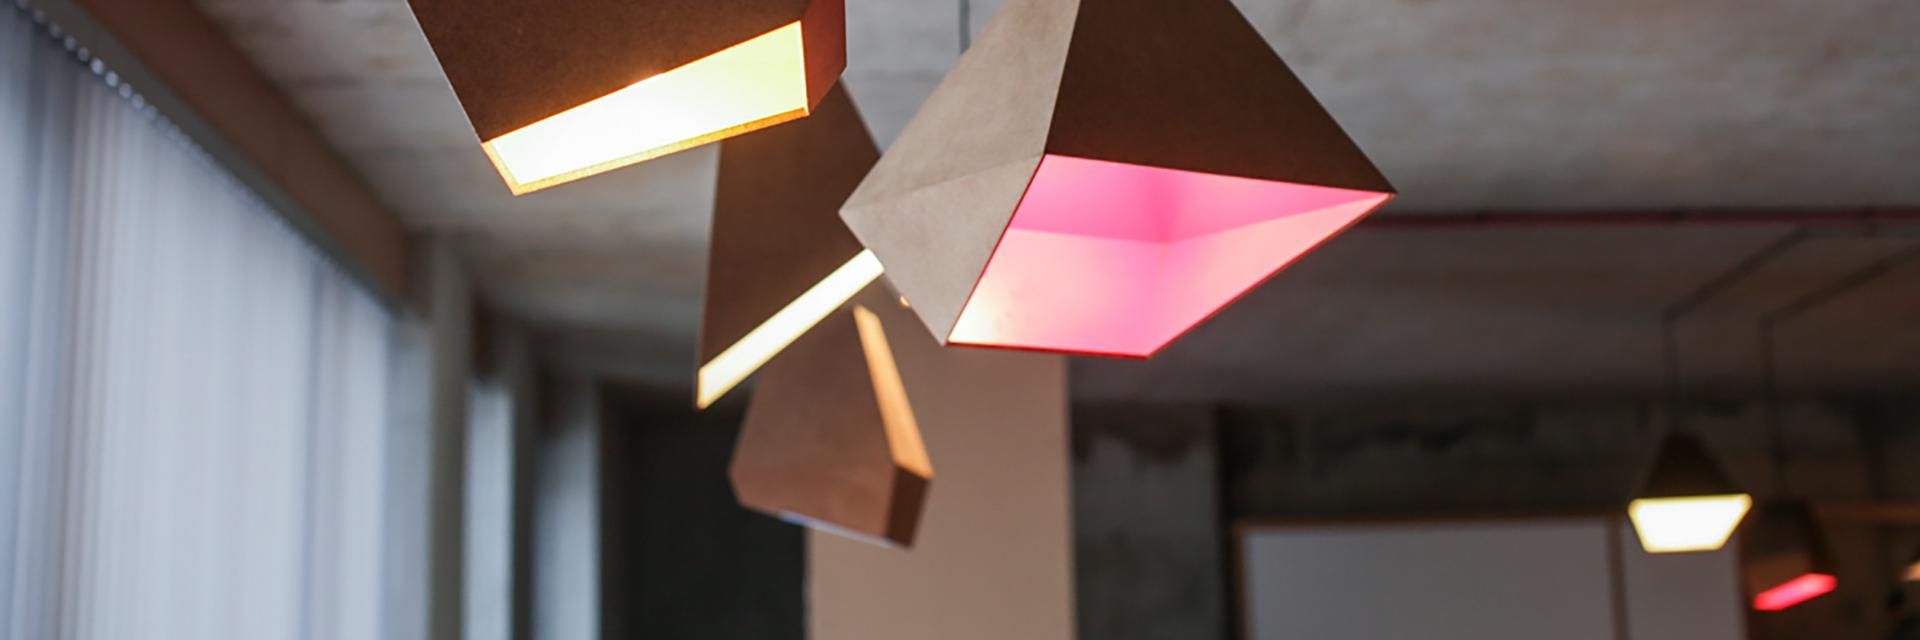 pyramid lamps, lighting design, lamps,